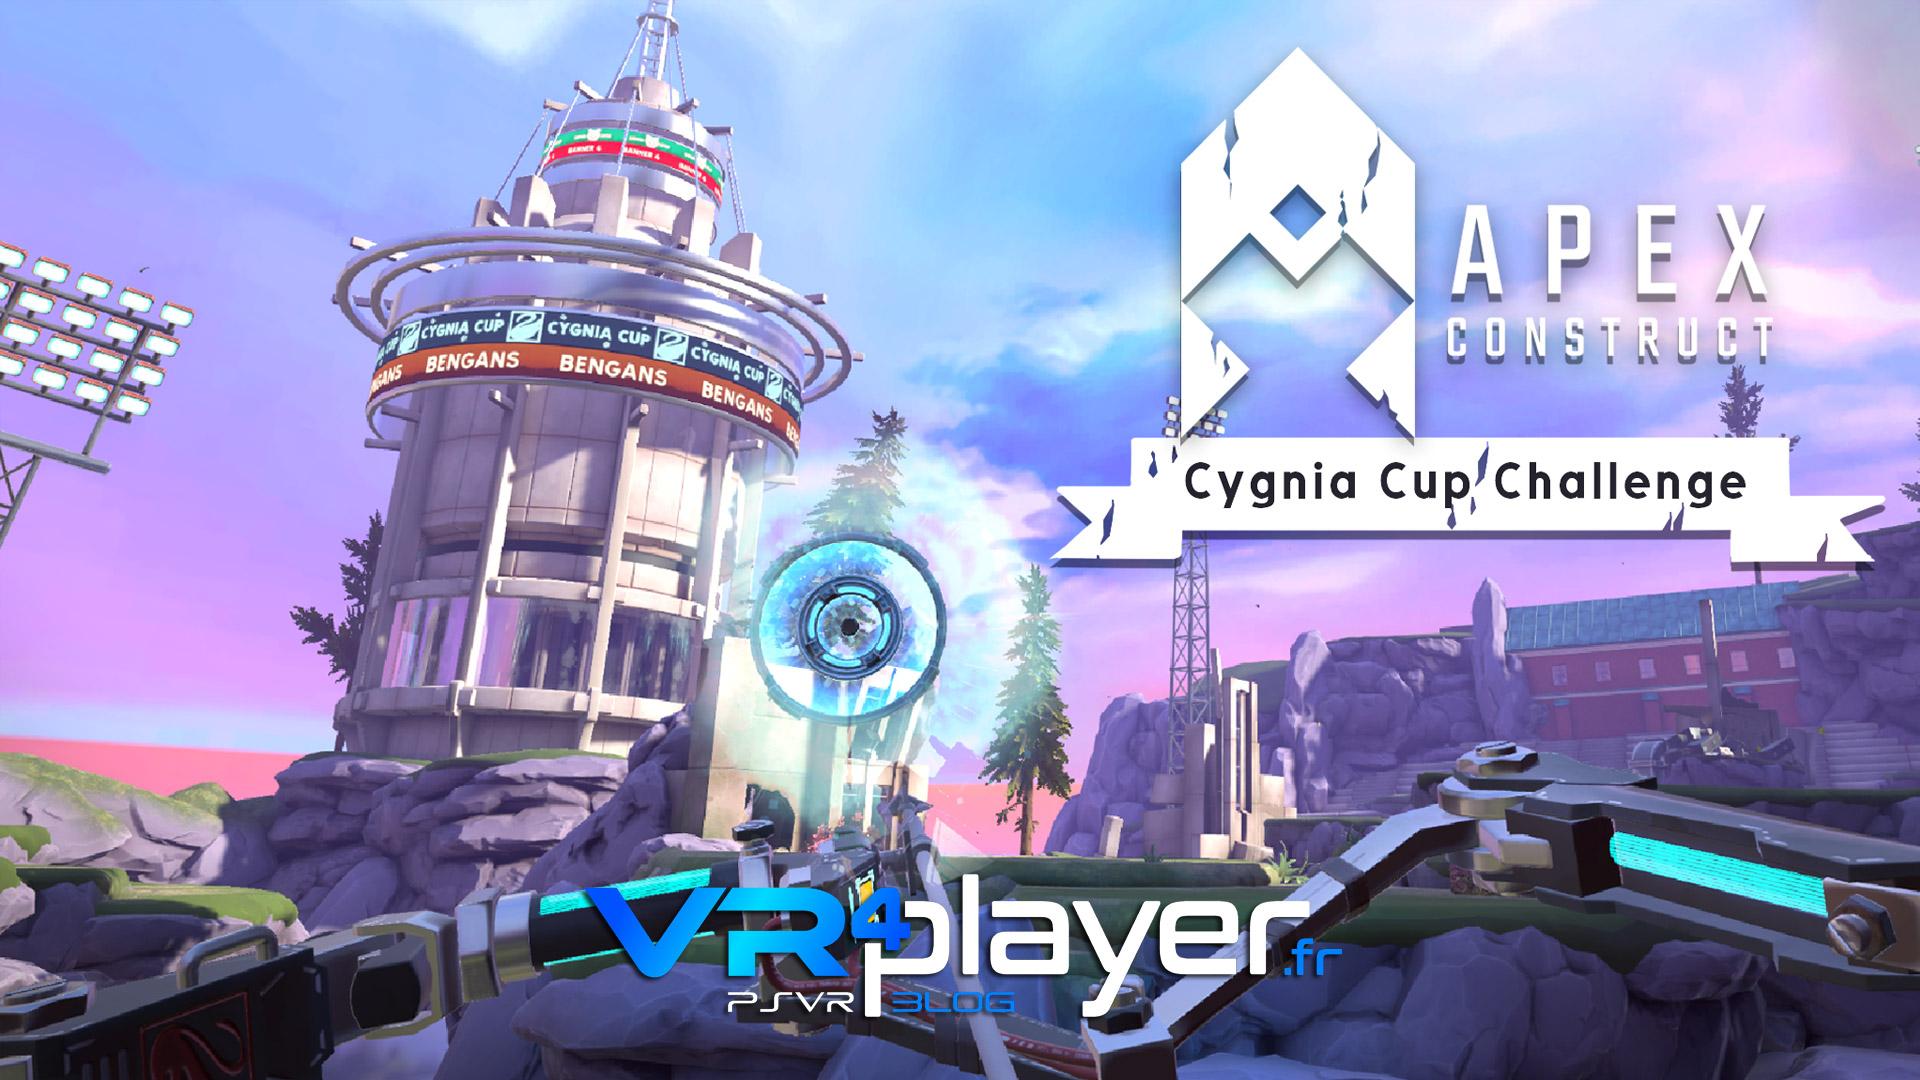 Apex Construct Cygnia Cup Challenge DLC - vr4player.fr